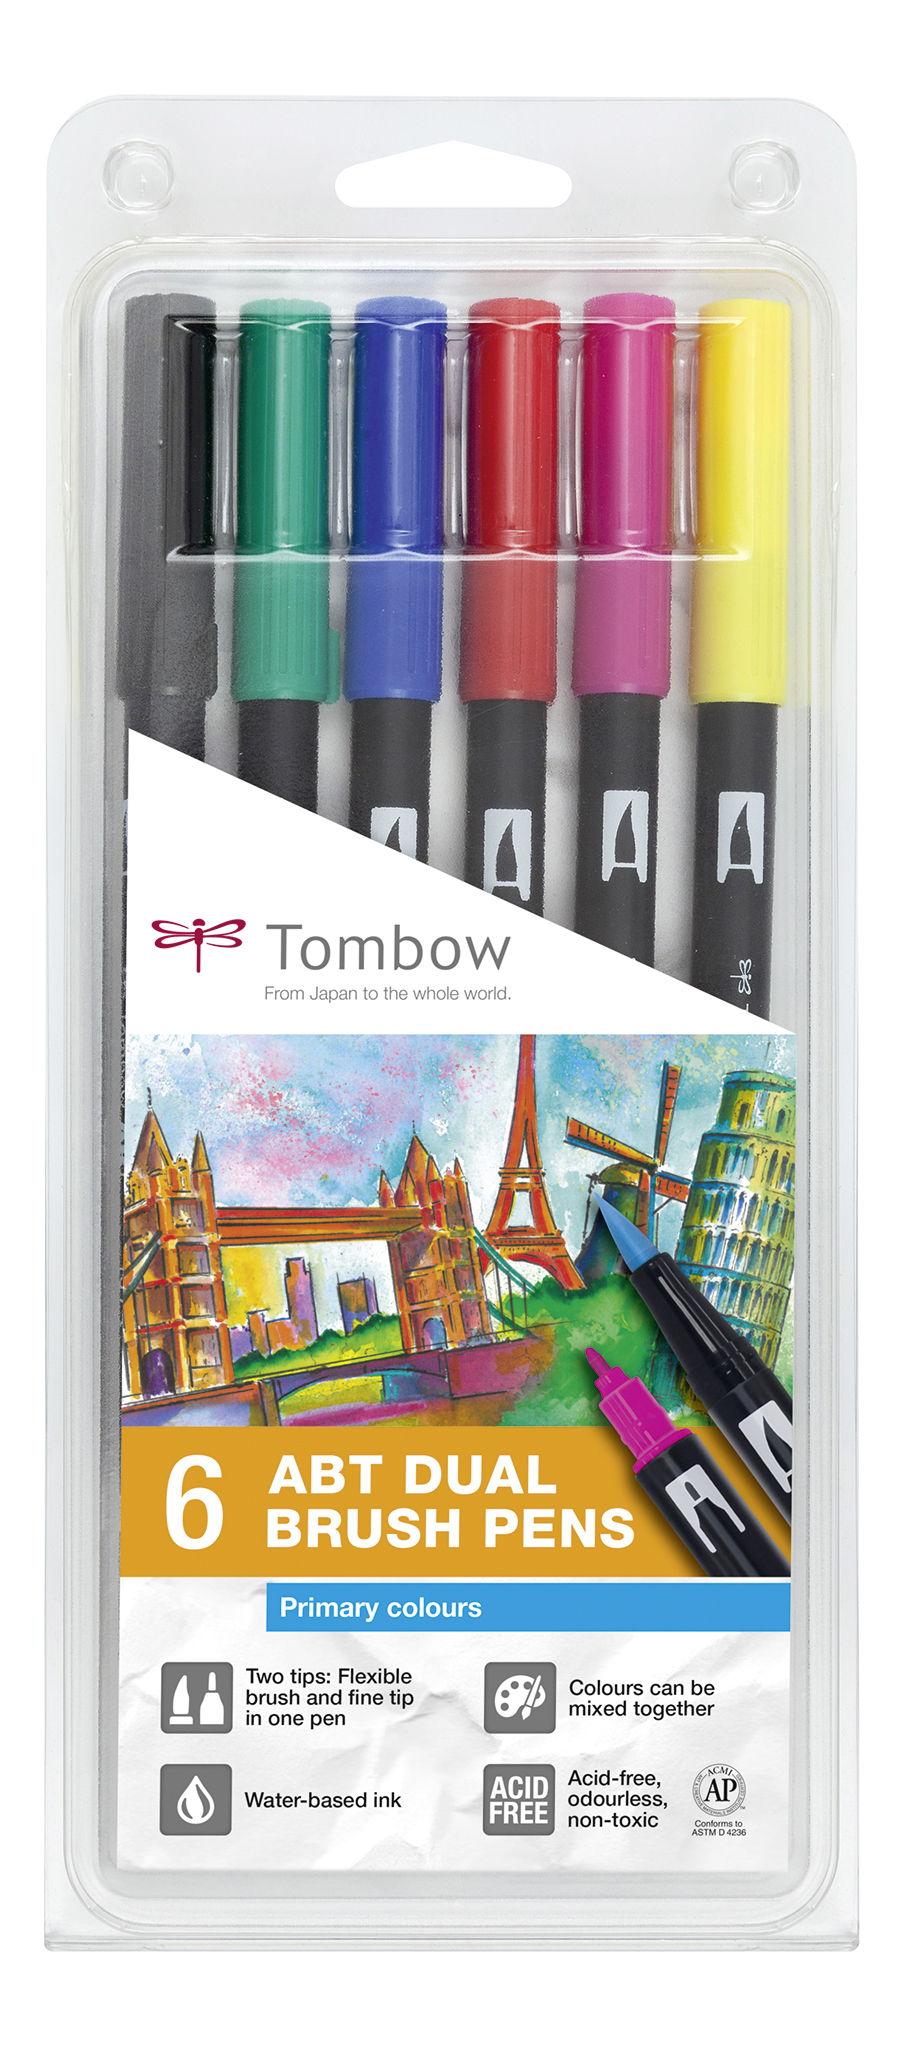 ABT Dual Brush Pen Primary clrs PK6